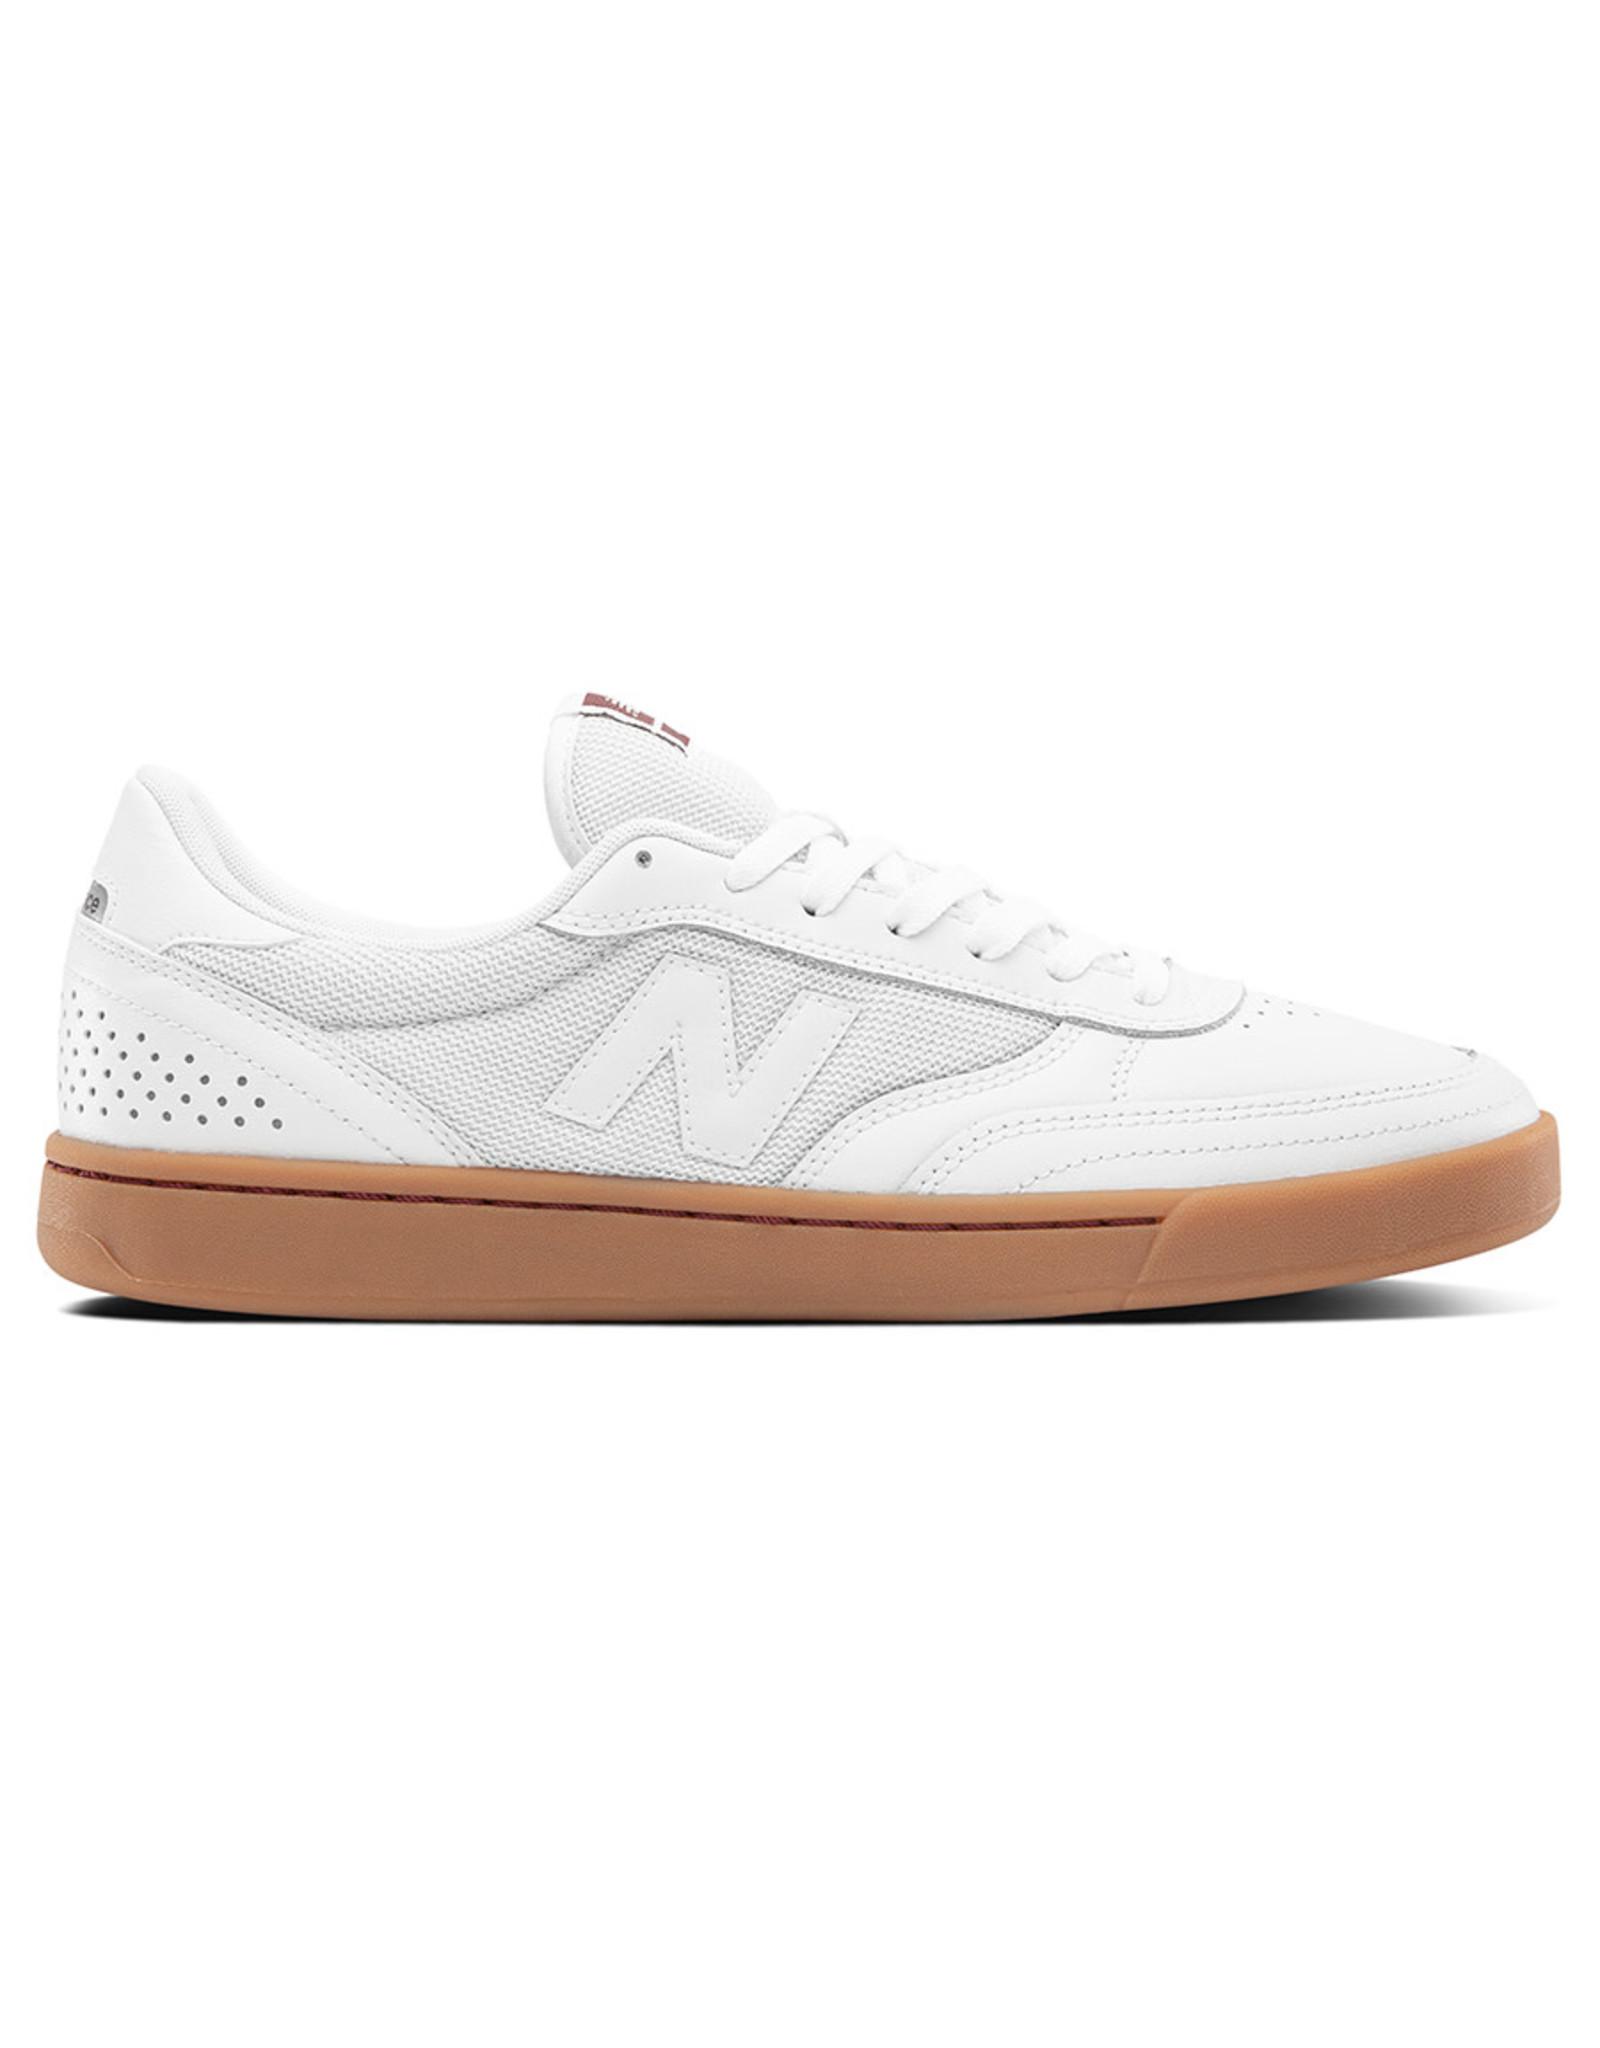 New Balance Numeric New Balance Numeric Shoe 440 Skate Shop Day (White/Gum)